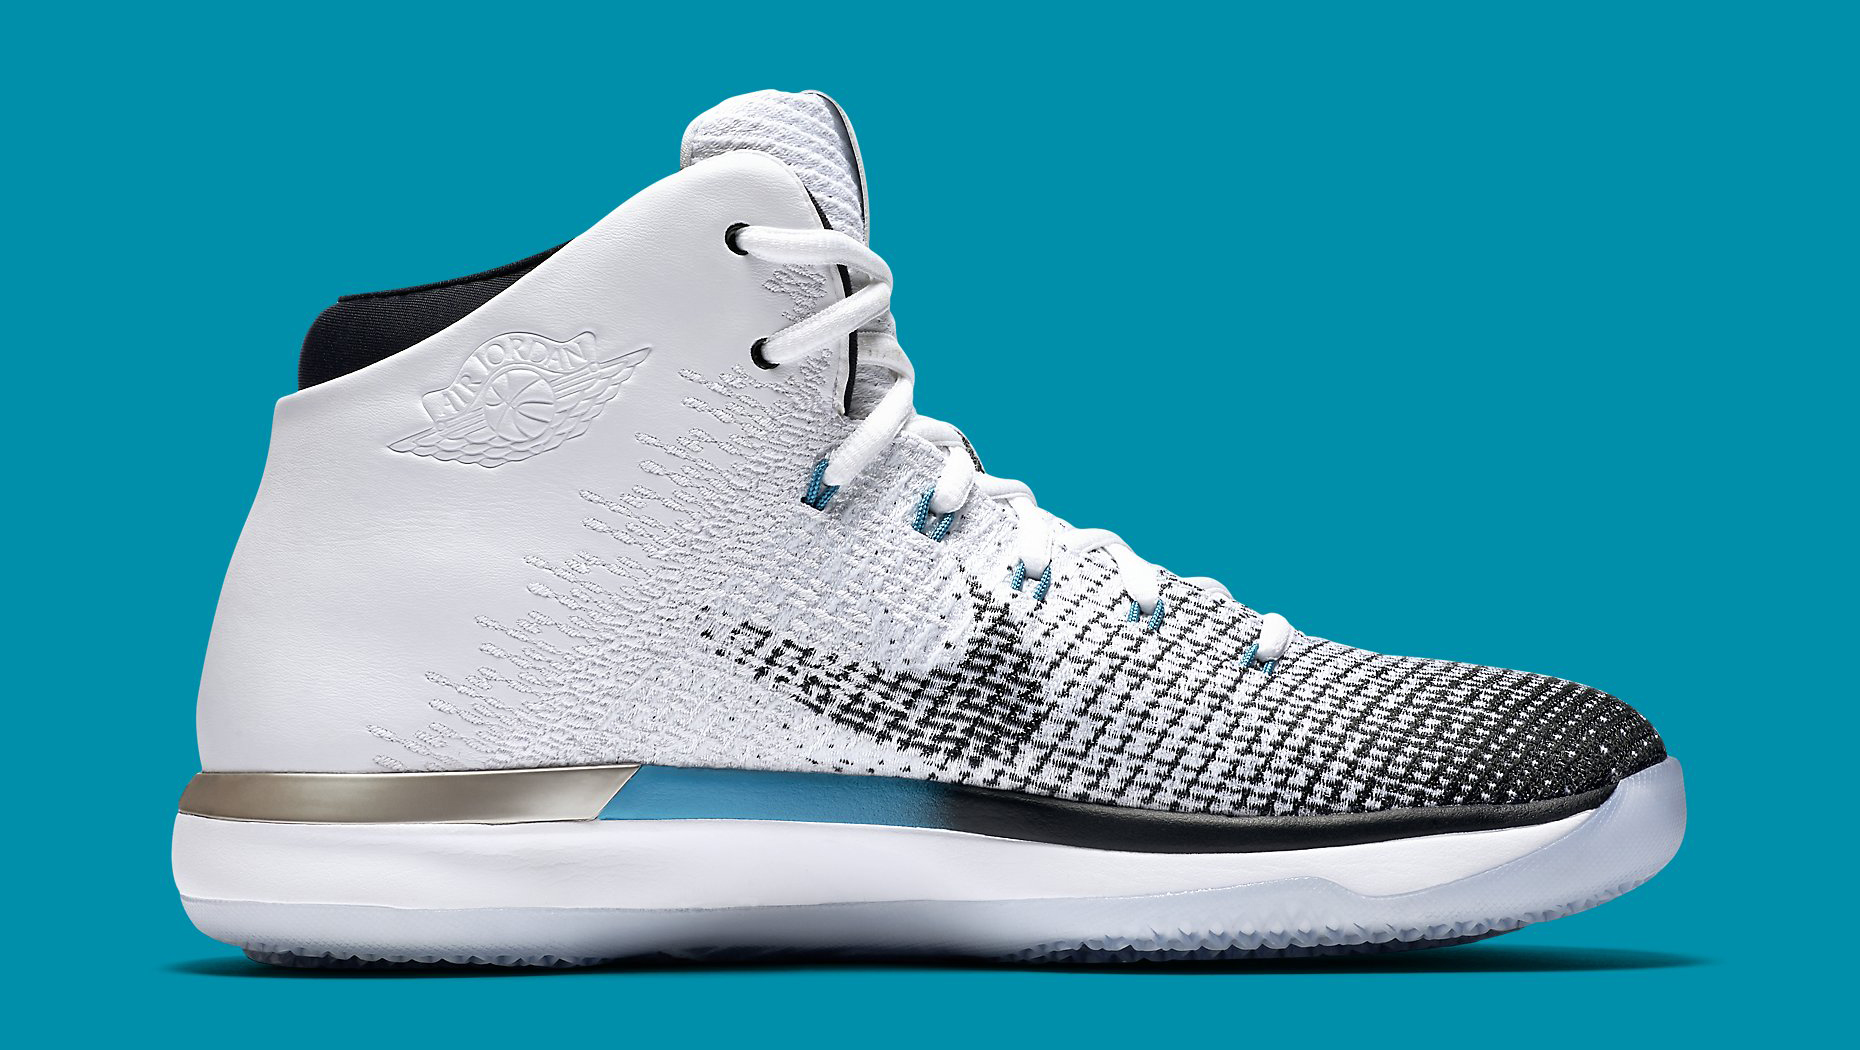 e85f3733489329 Image via Nike N7 Air Jordan 31 854272-003 Medial ...